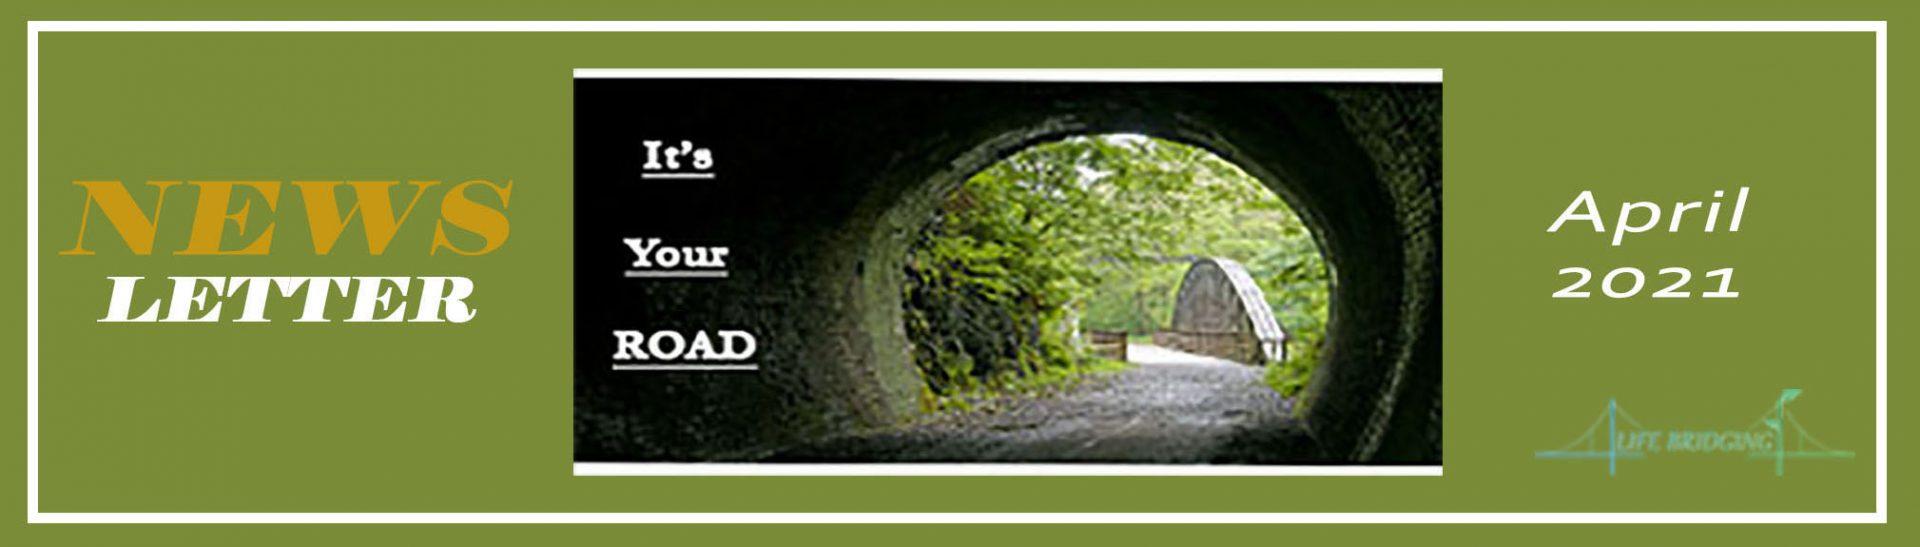 Life Bridging April Newsletter 2021